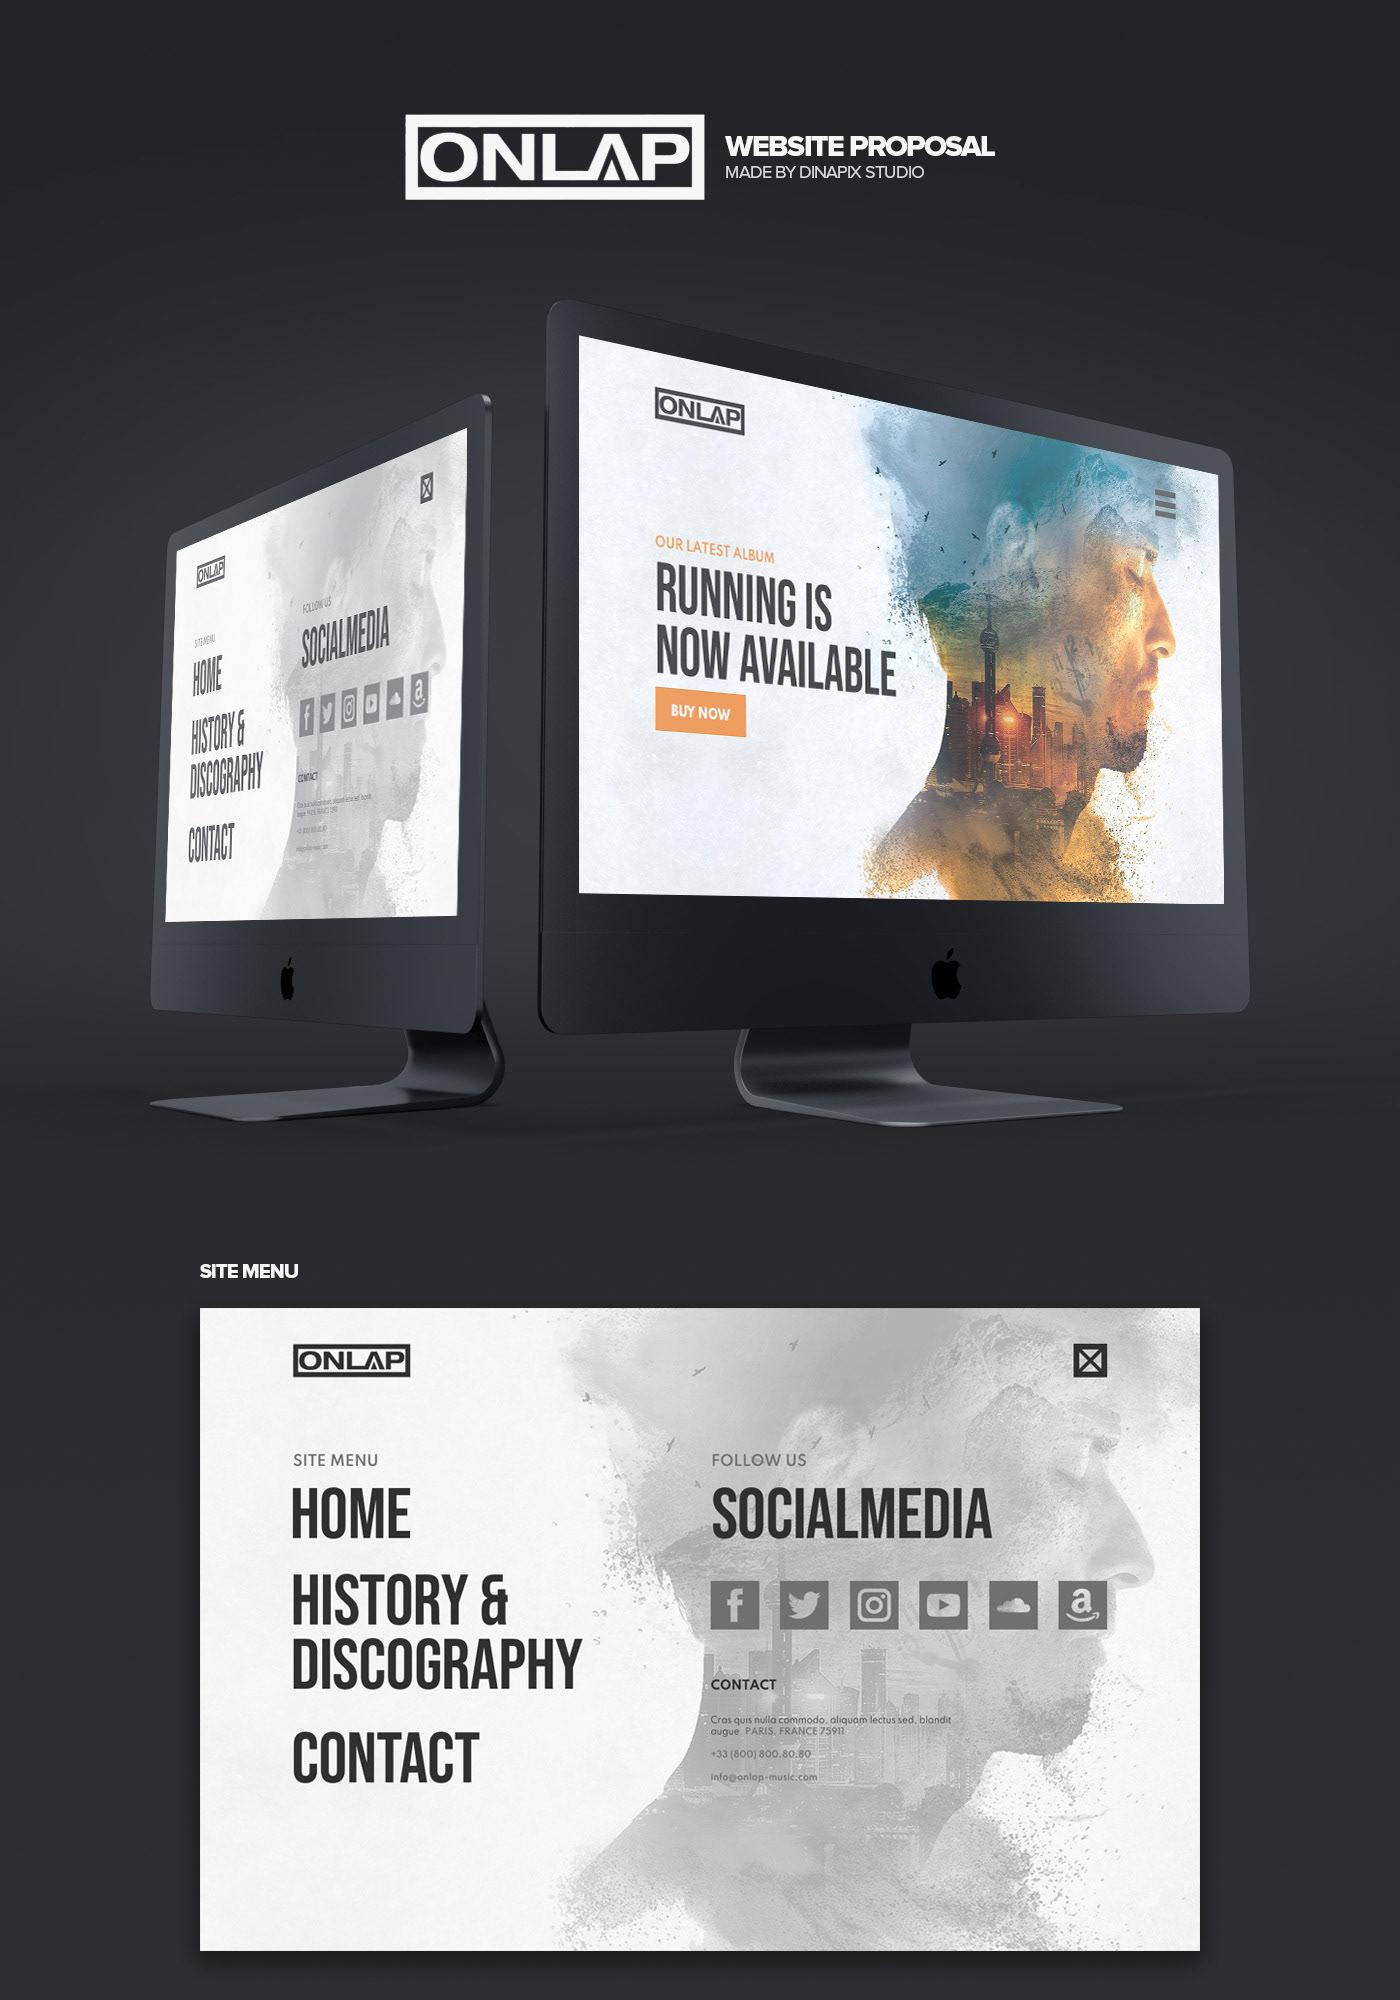 Image may contain: computer, television and computer monitor